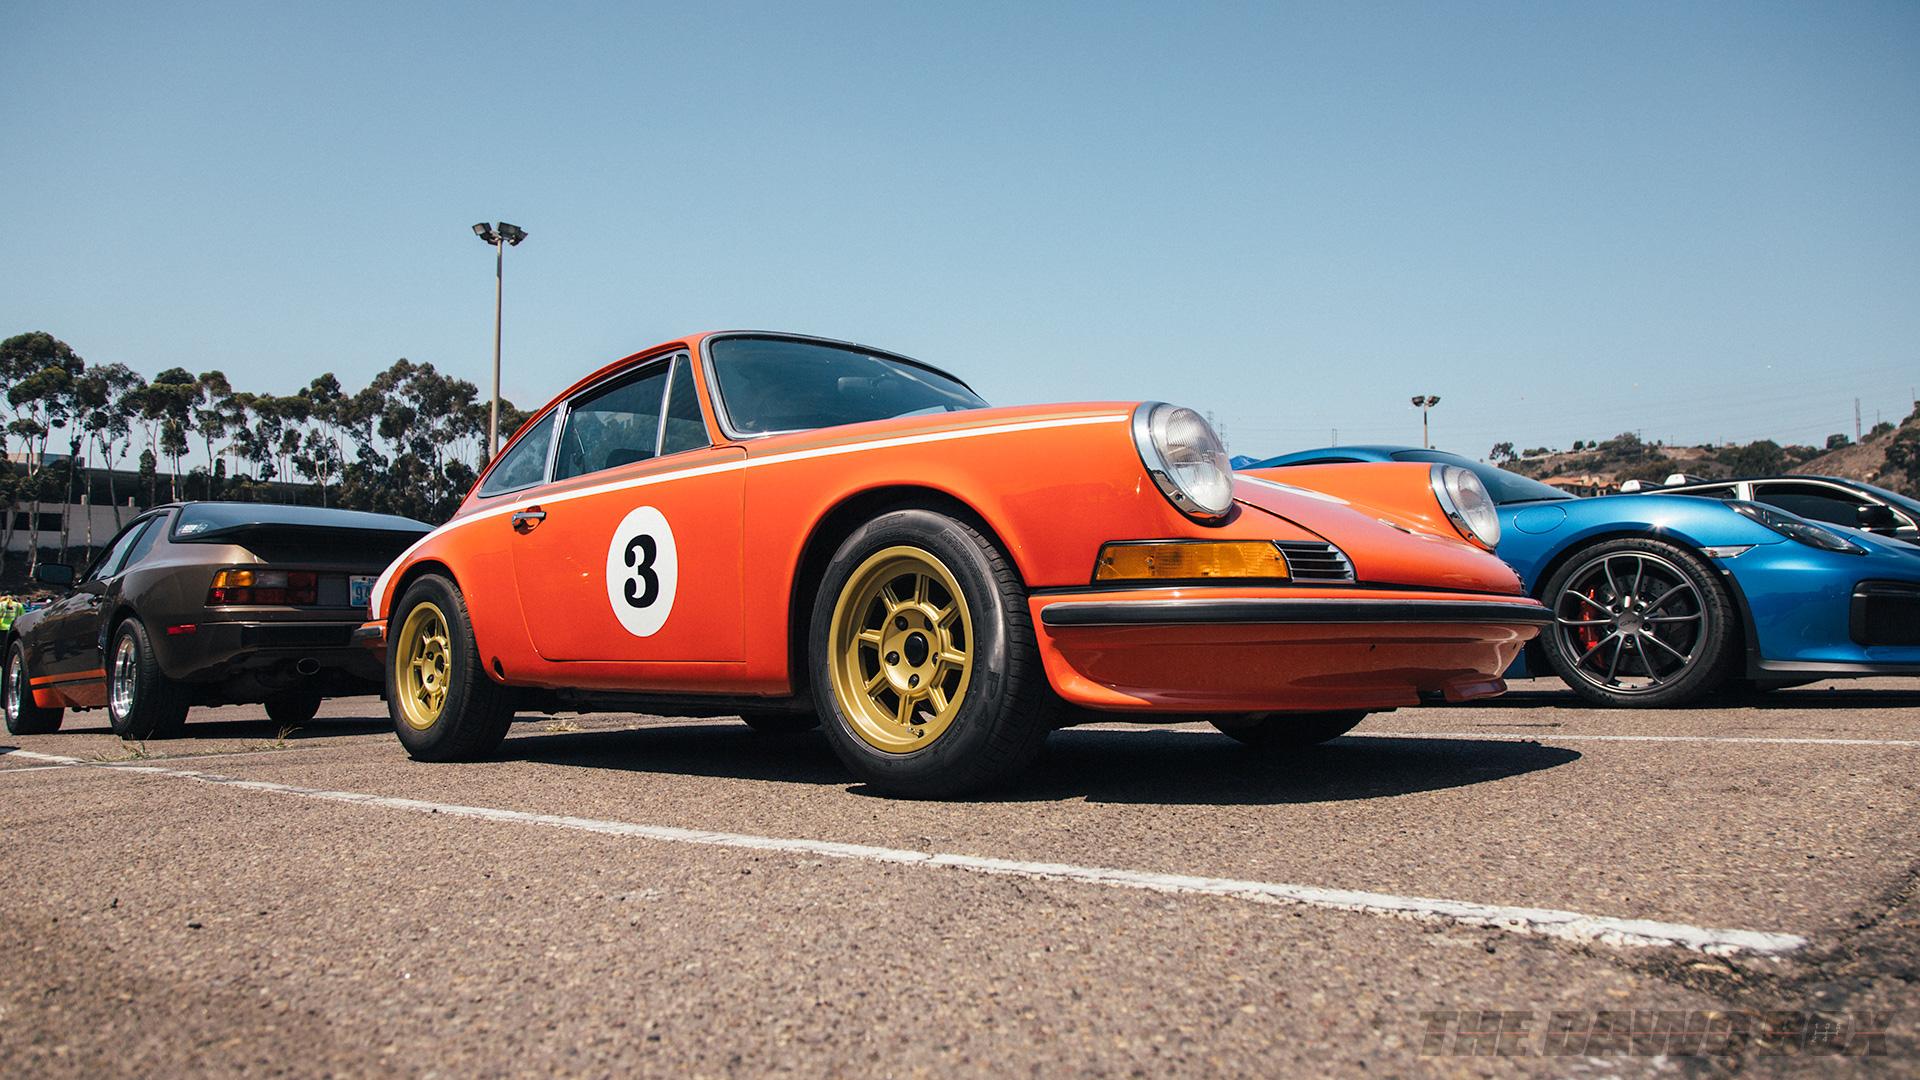 Orange Air-cooled Porsche 911 at Big Socal Euro